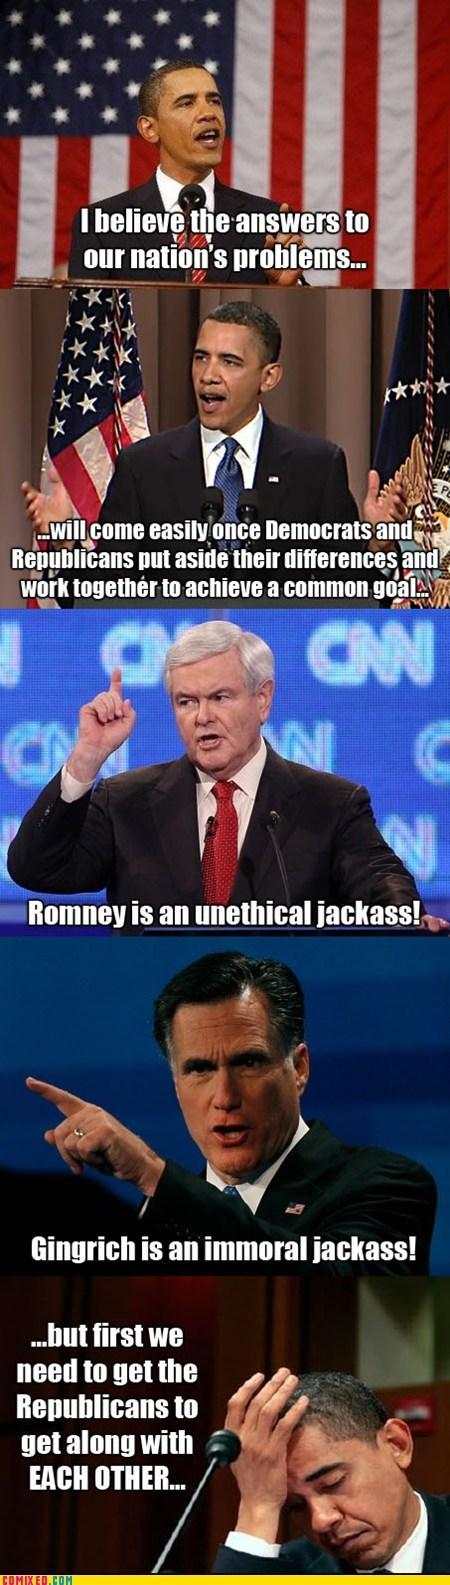 barack obama comic Hall of Fame Mitt Romney newt gingrich political pictures - 5739471104